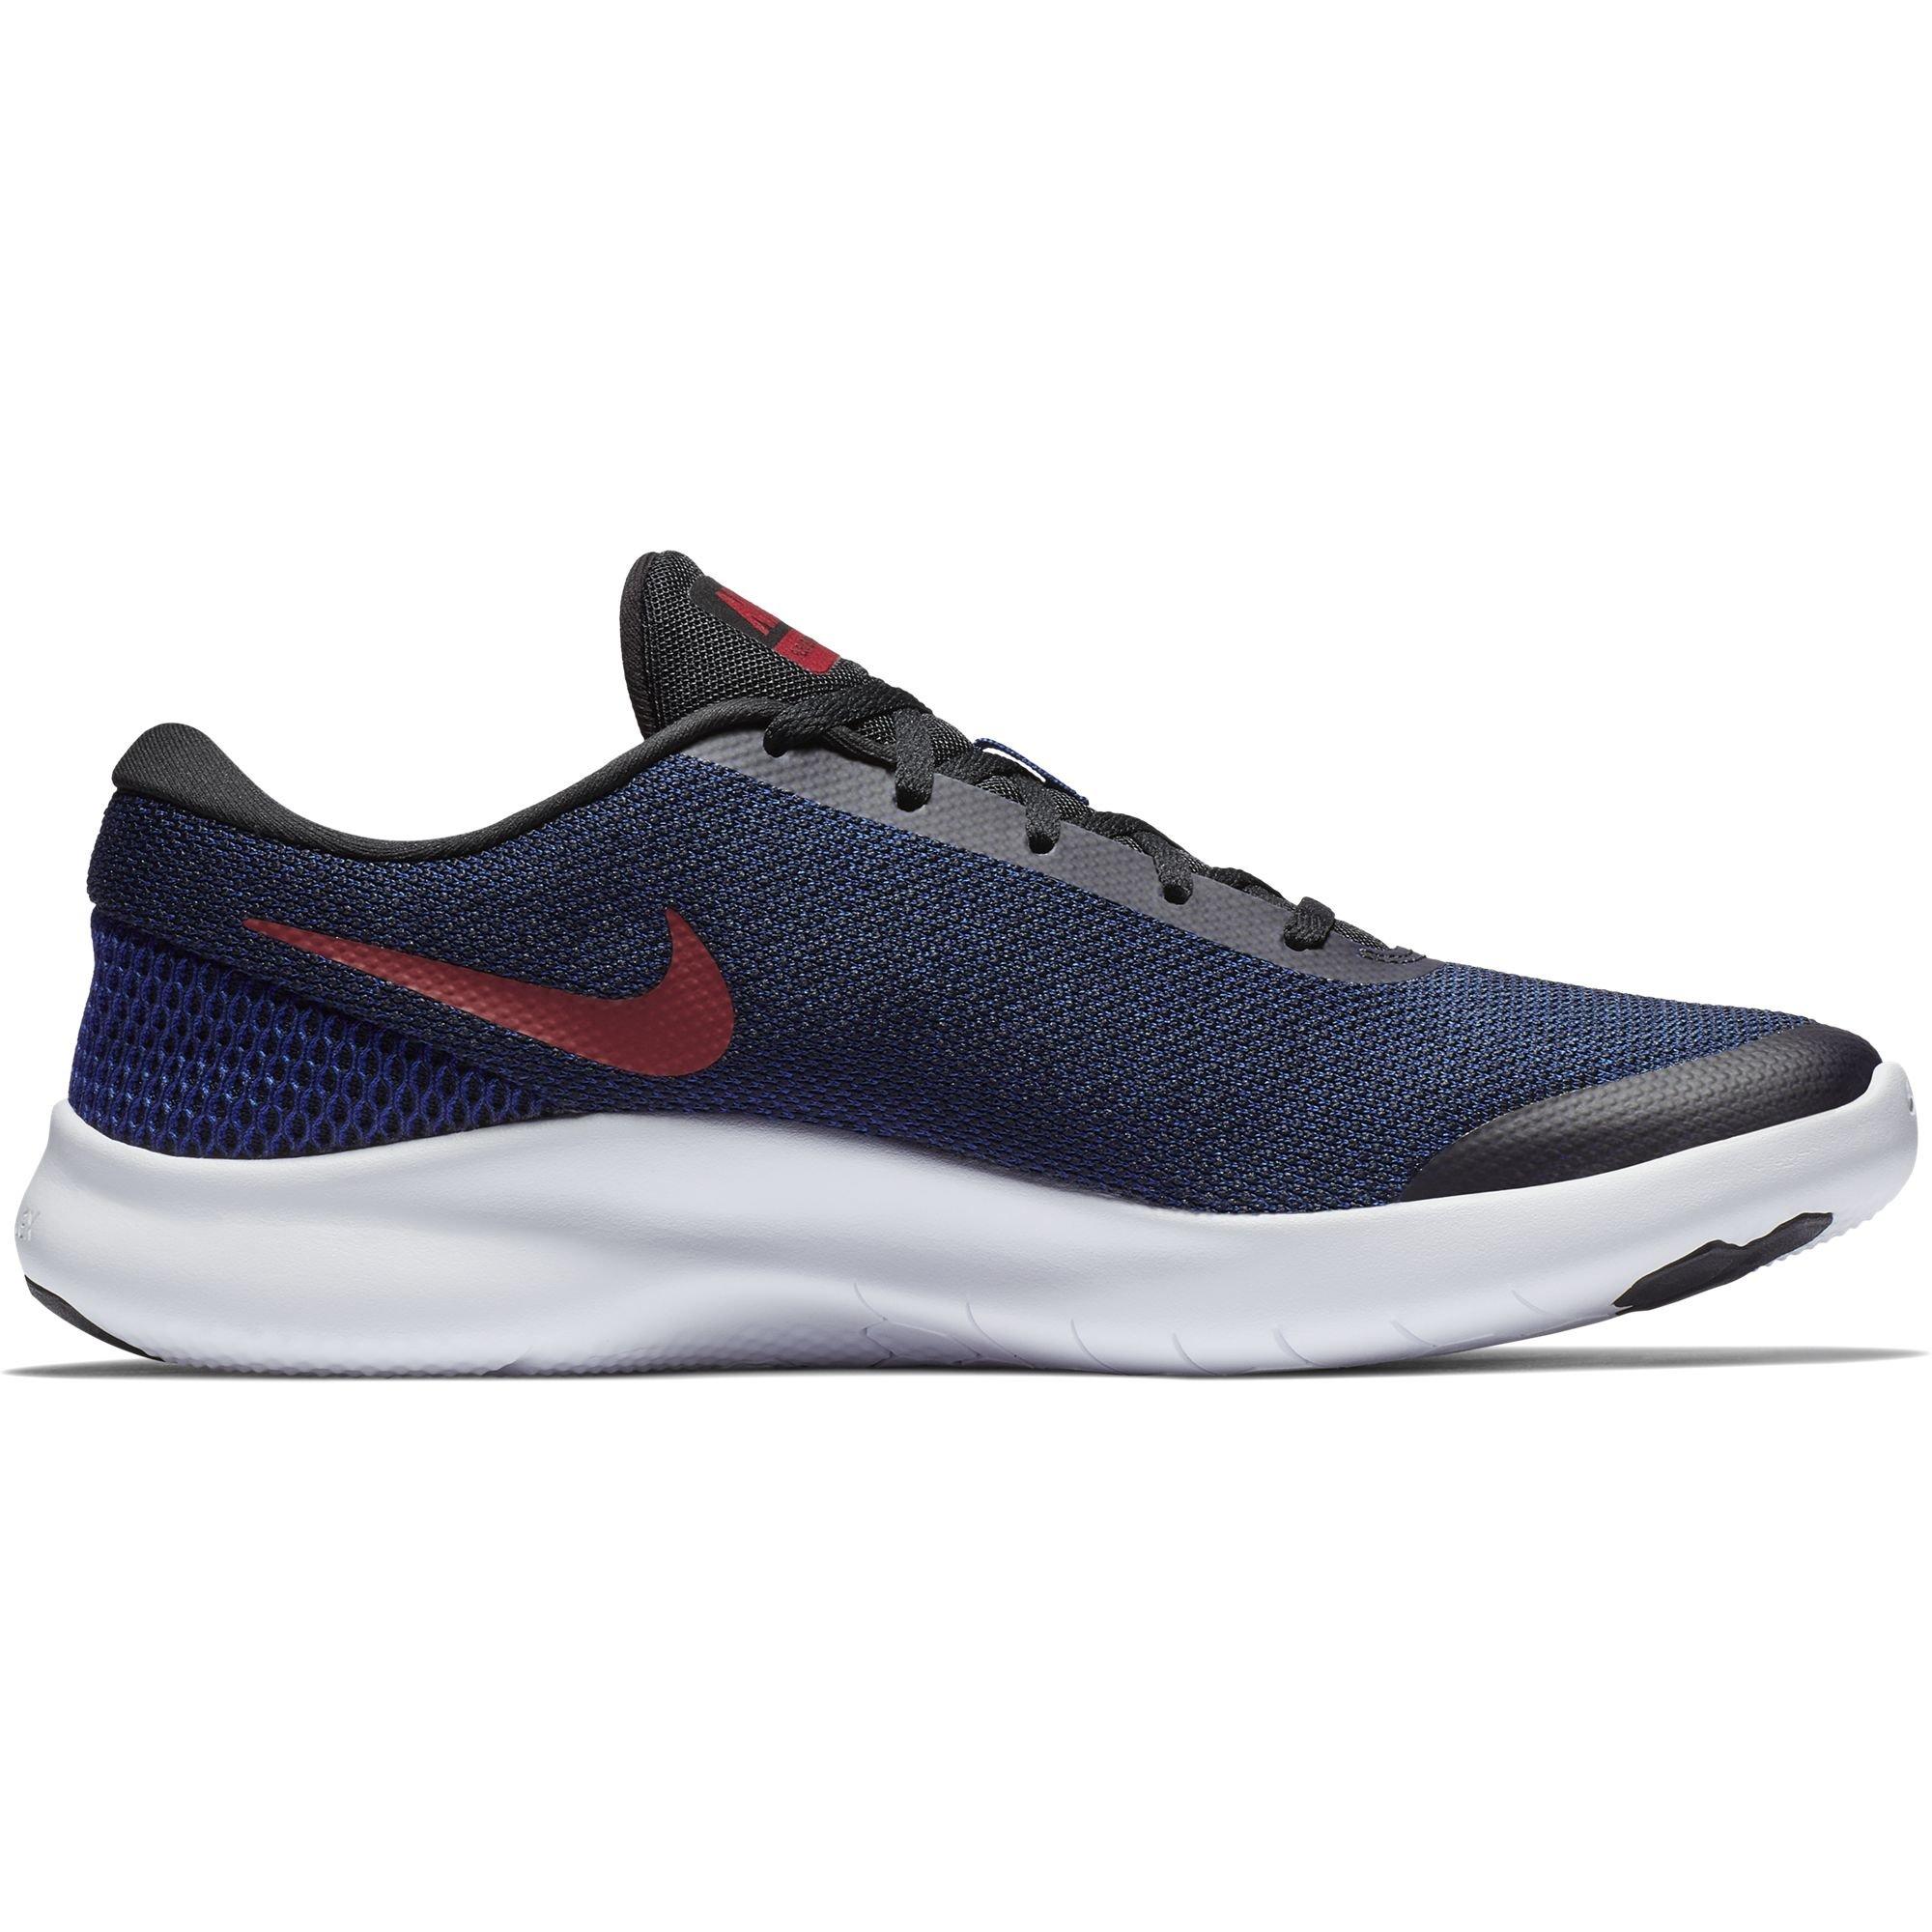 c93e212f55f1 Galleon - Nike Men s Flex Experience RN 7 Running Shoe Black Red Crush Deep  Royal Blue White (10 D US)